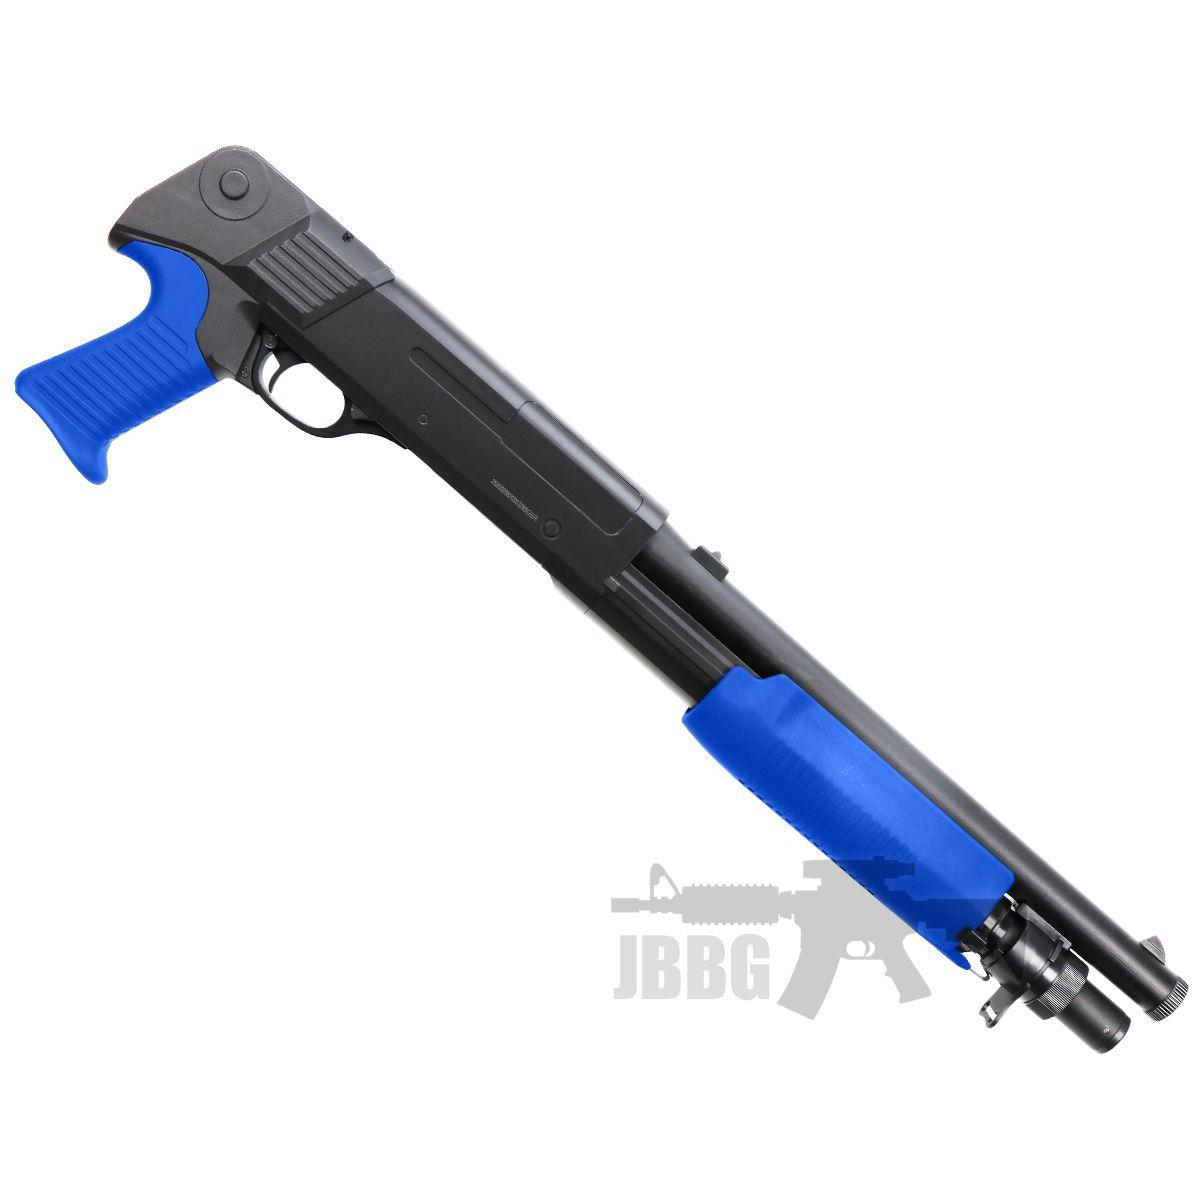 m56b shotgun airsoft blue at jbbg 1